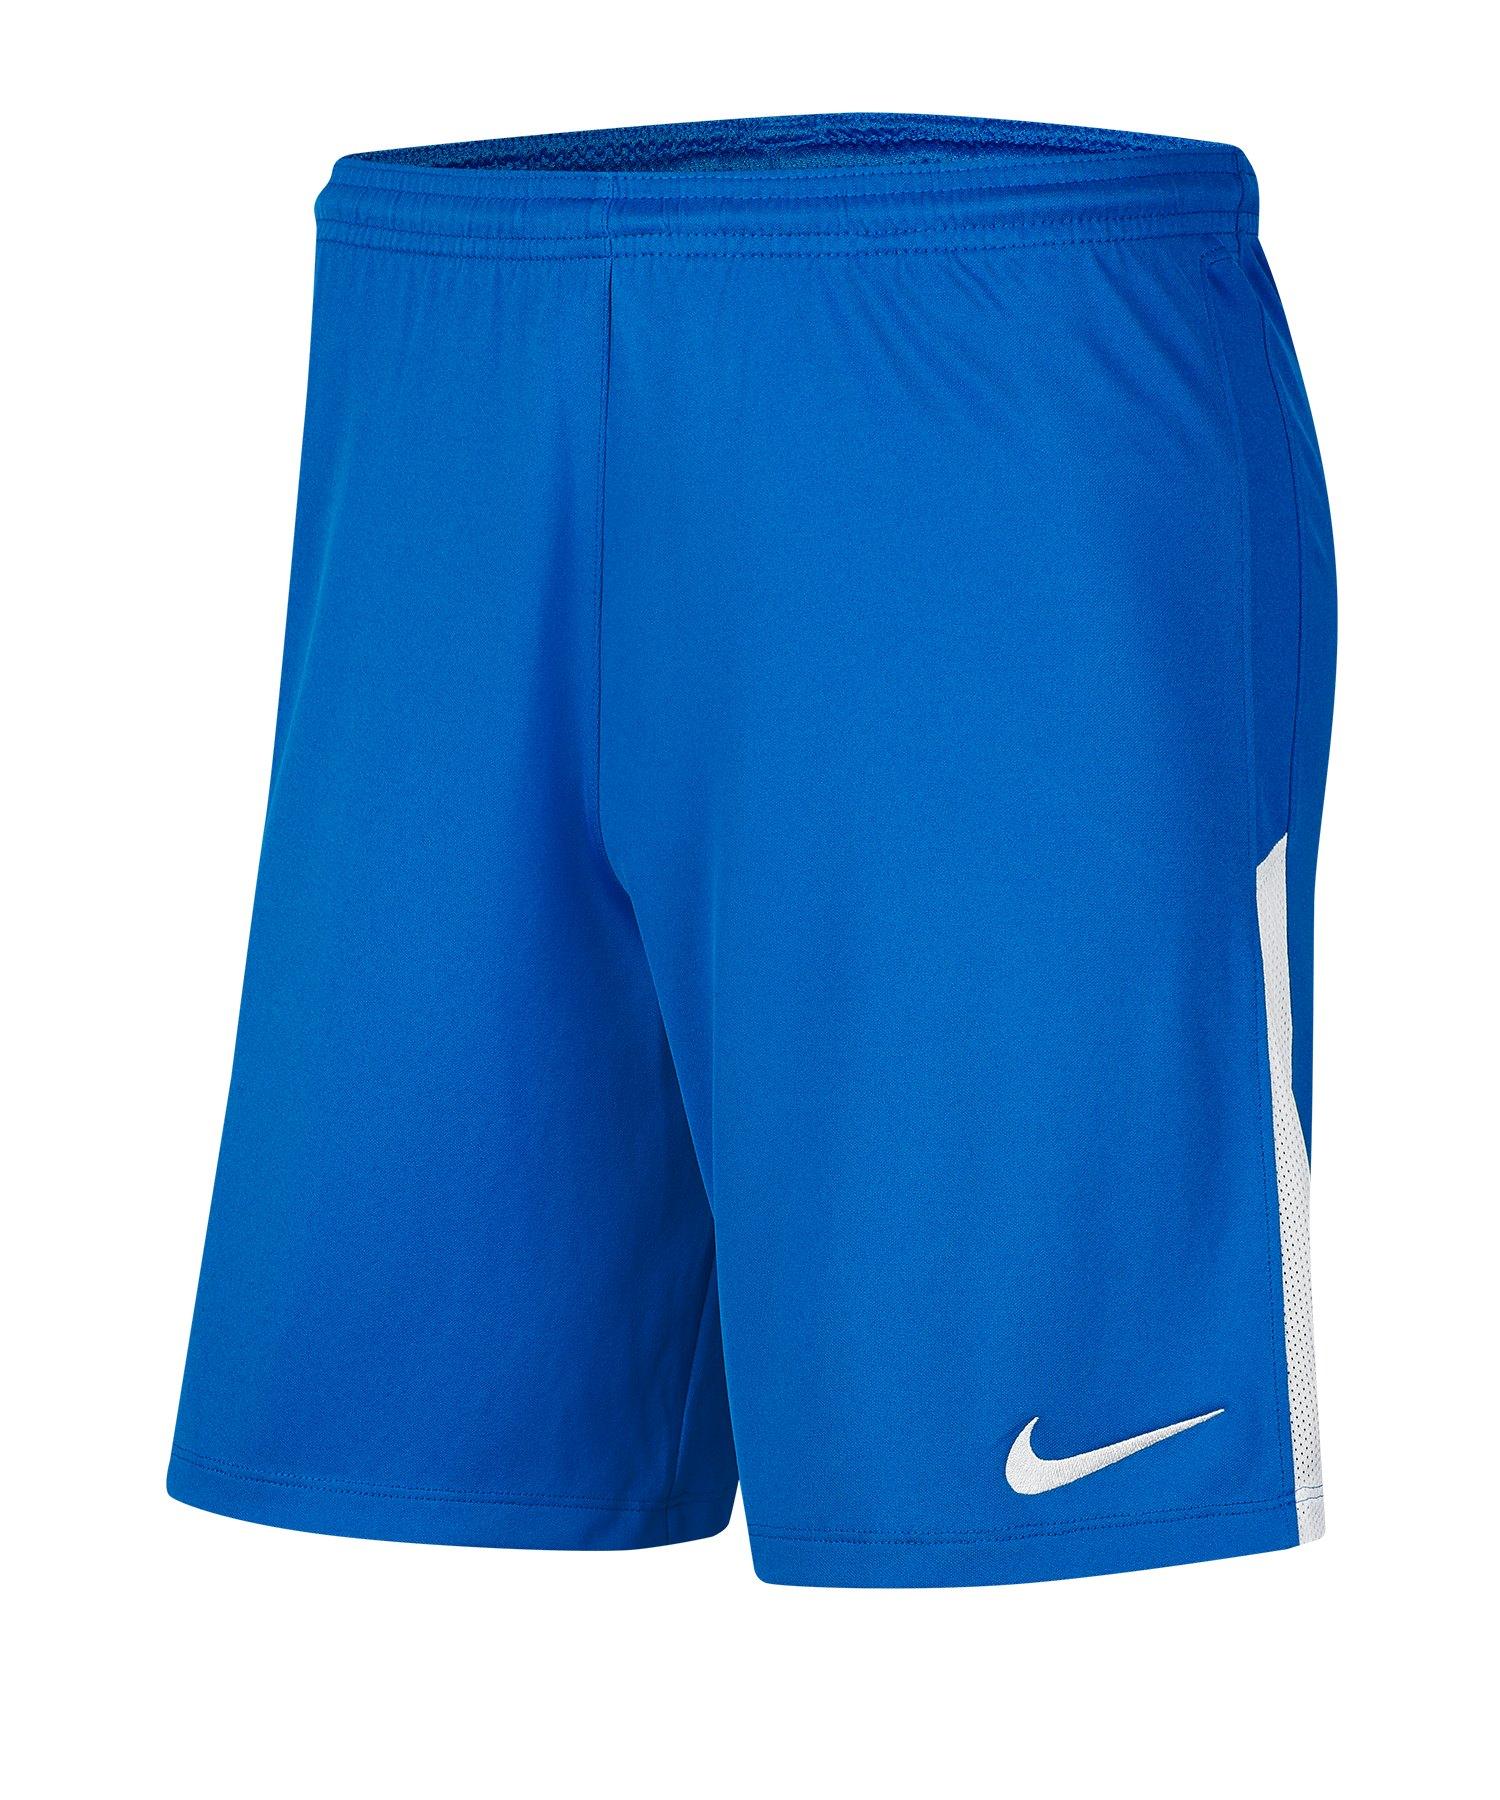 Nike League Knit II Short Blau Weiss F463 - blau